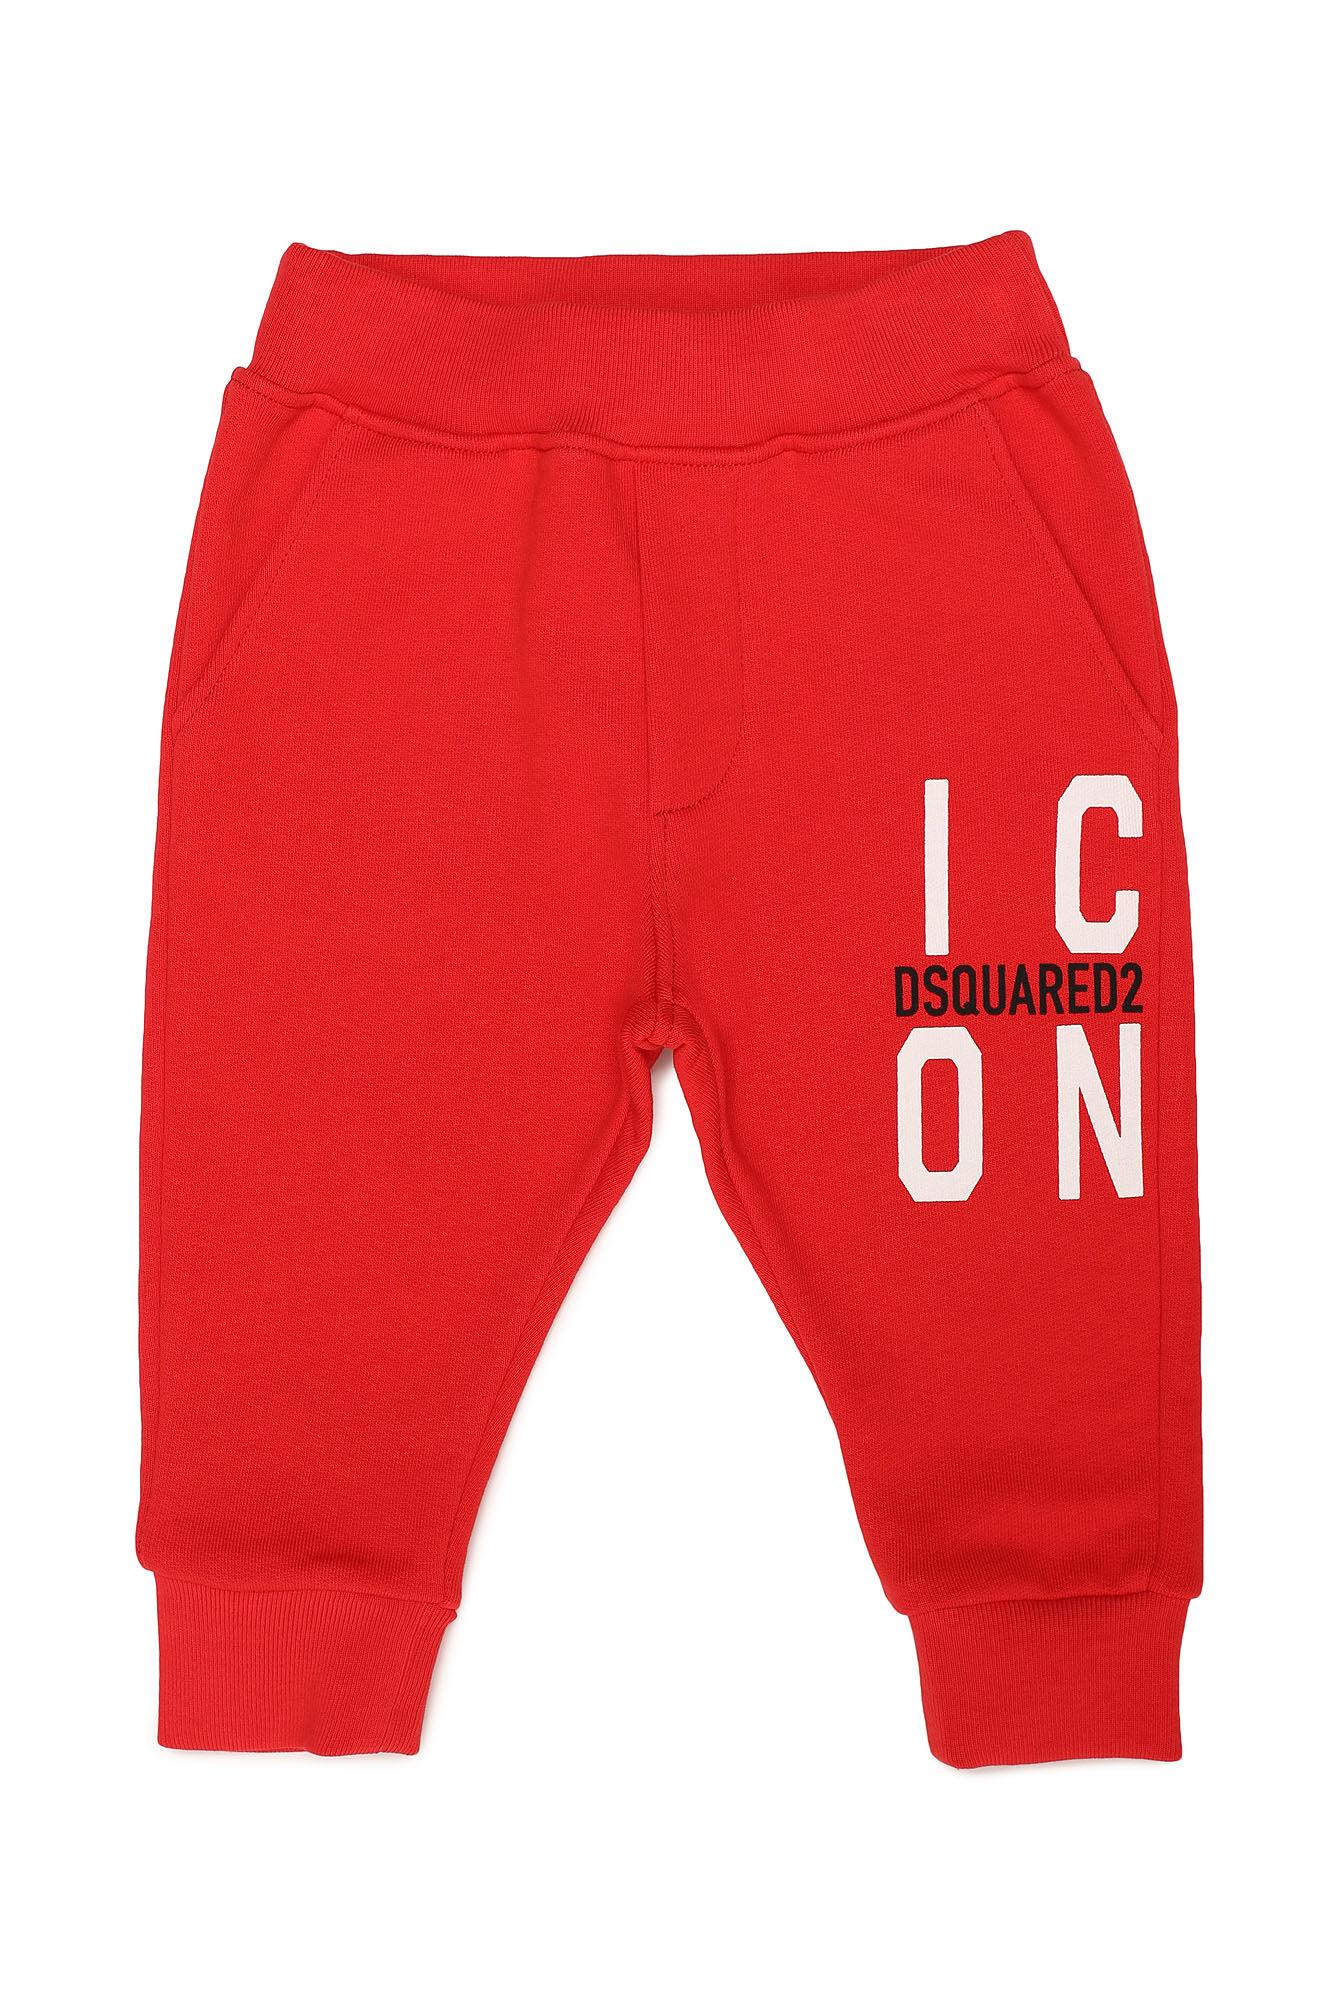 Icon Pantaloni - Dsquared2 Junior